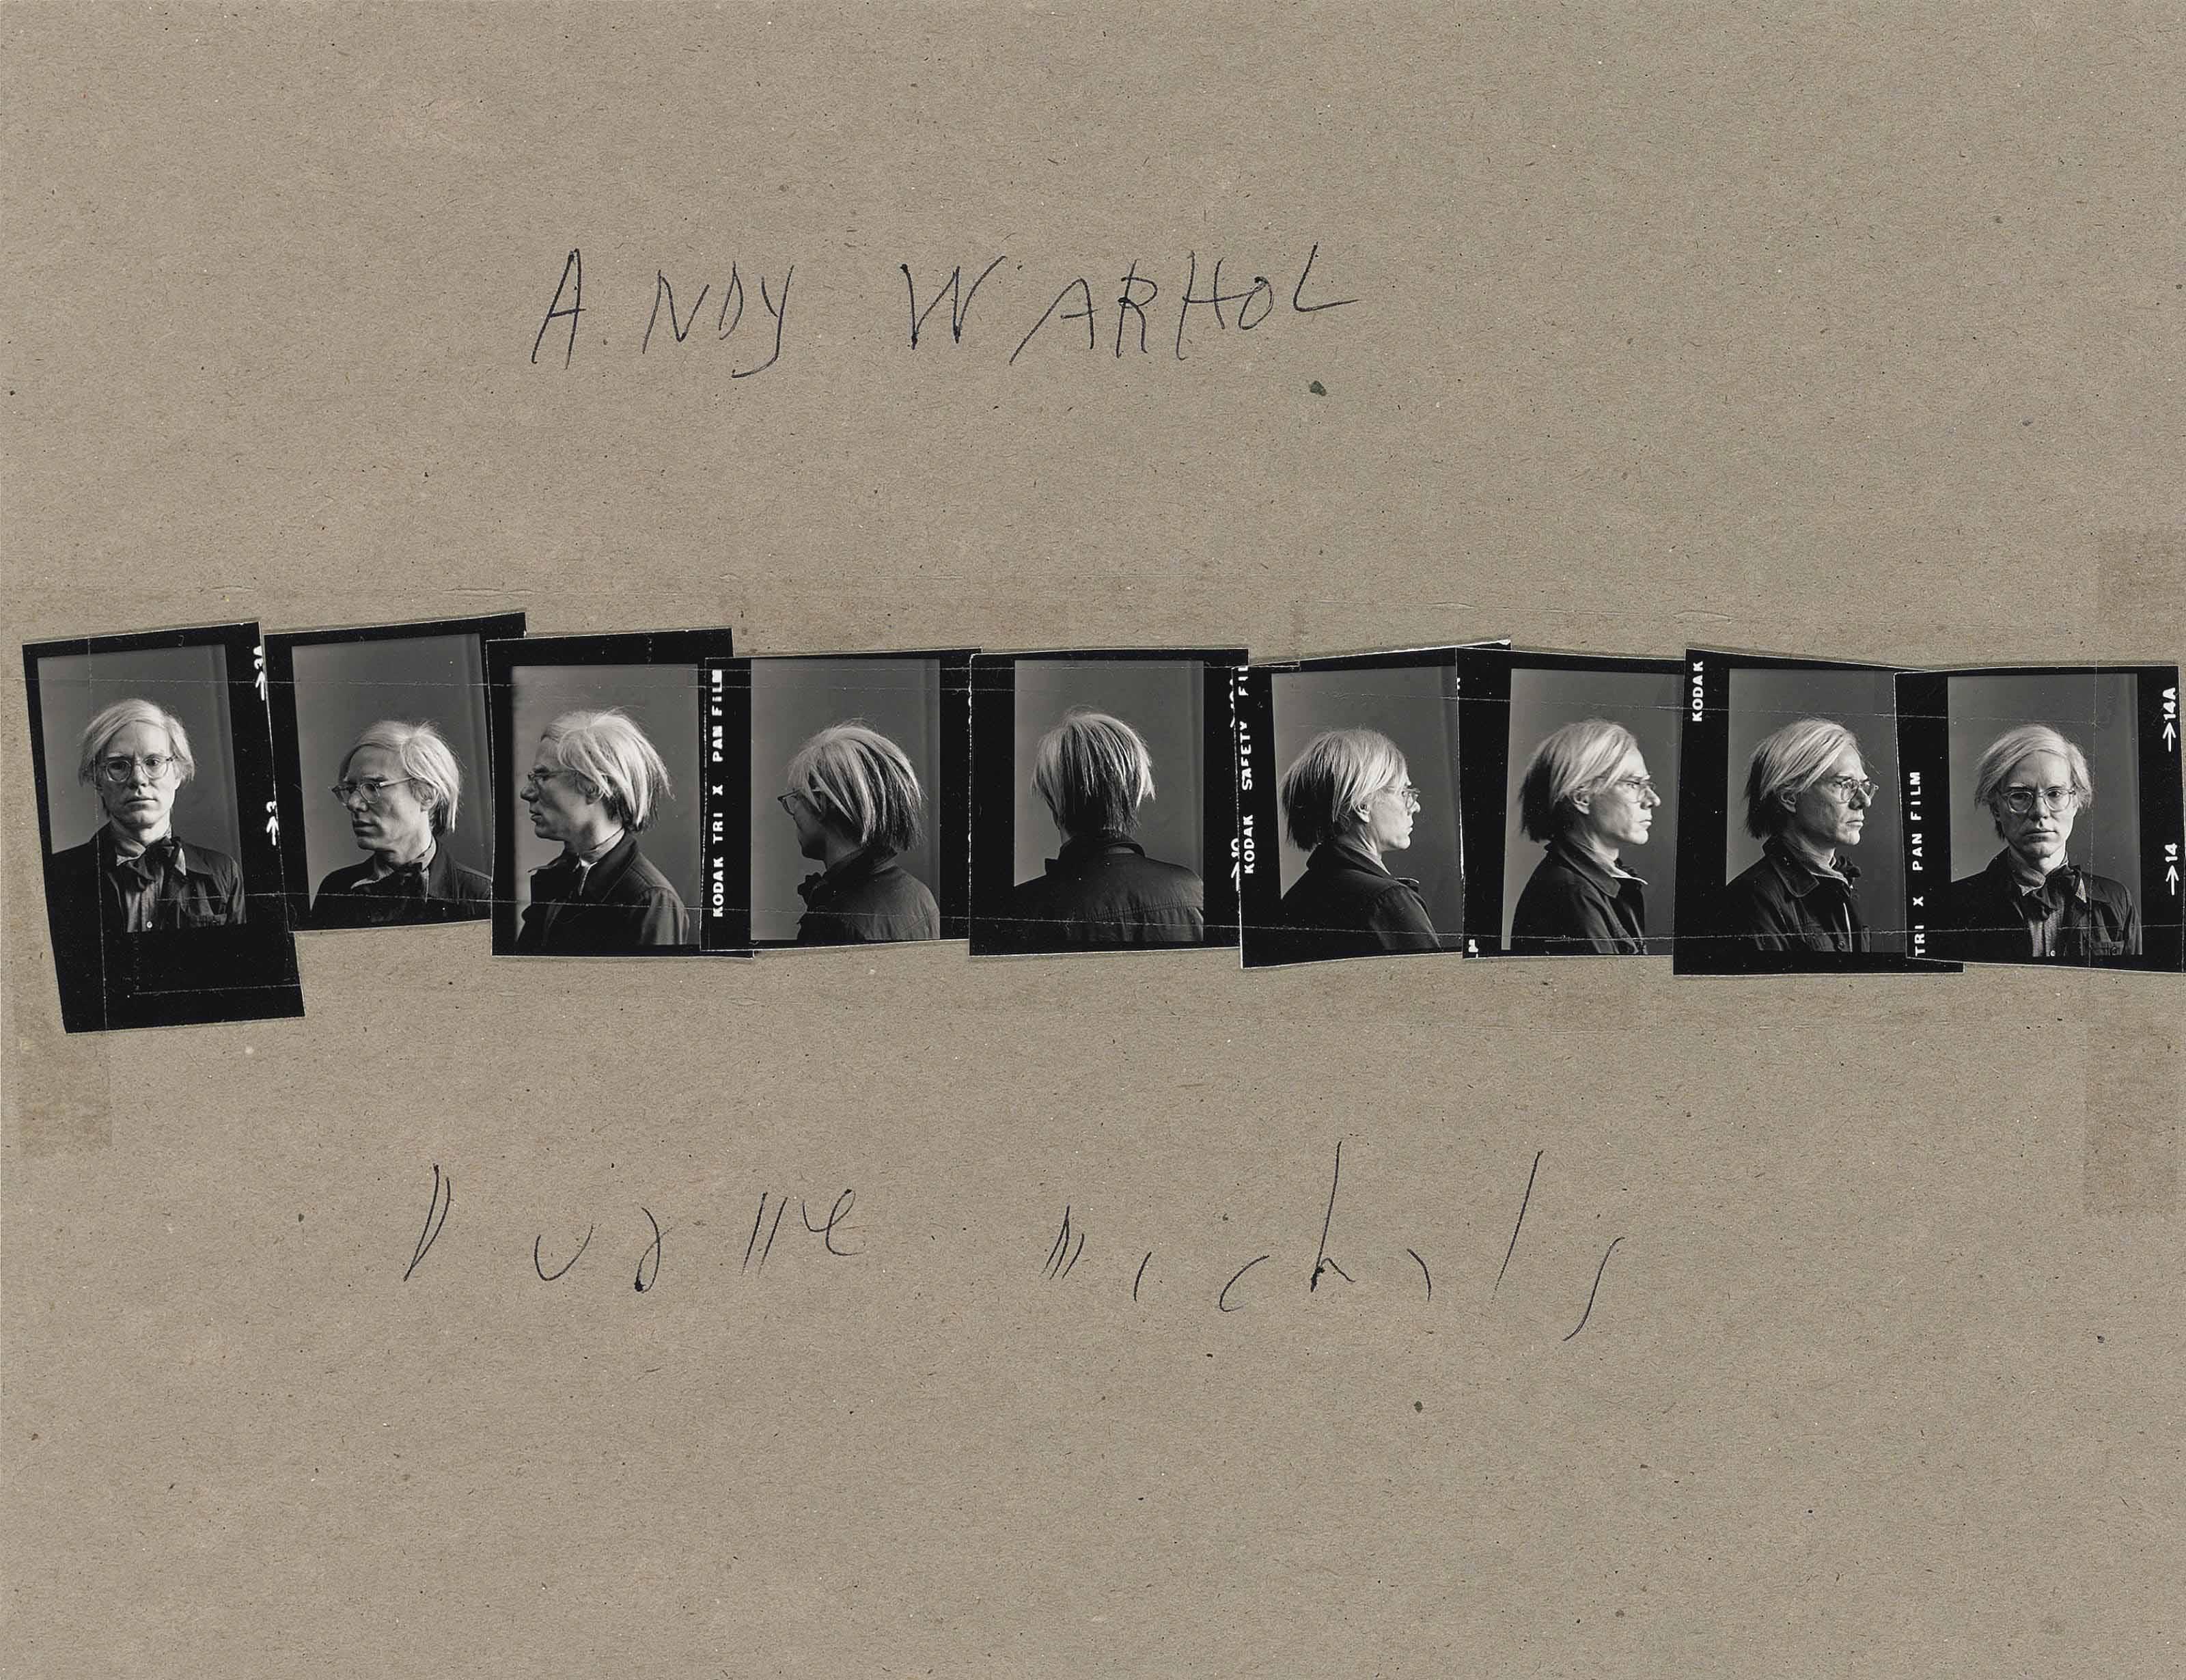 Andy Warhol, c. 1973